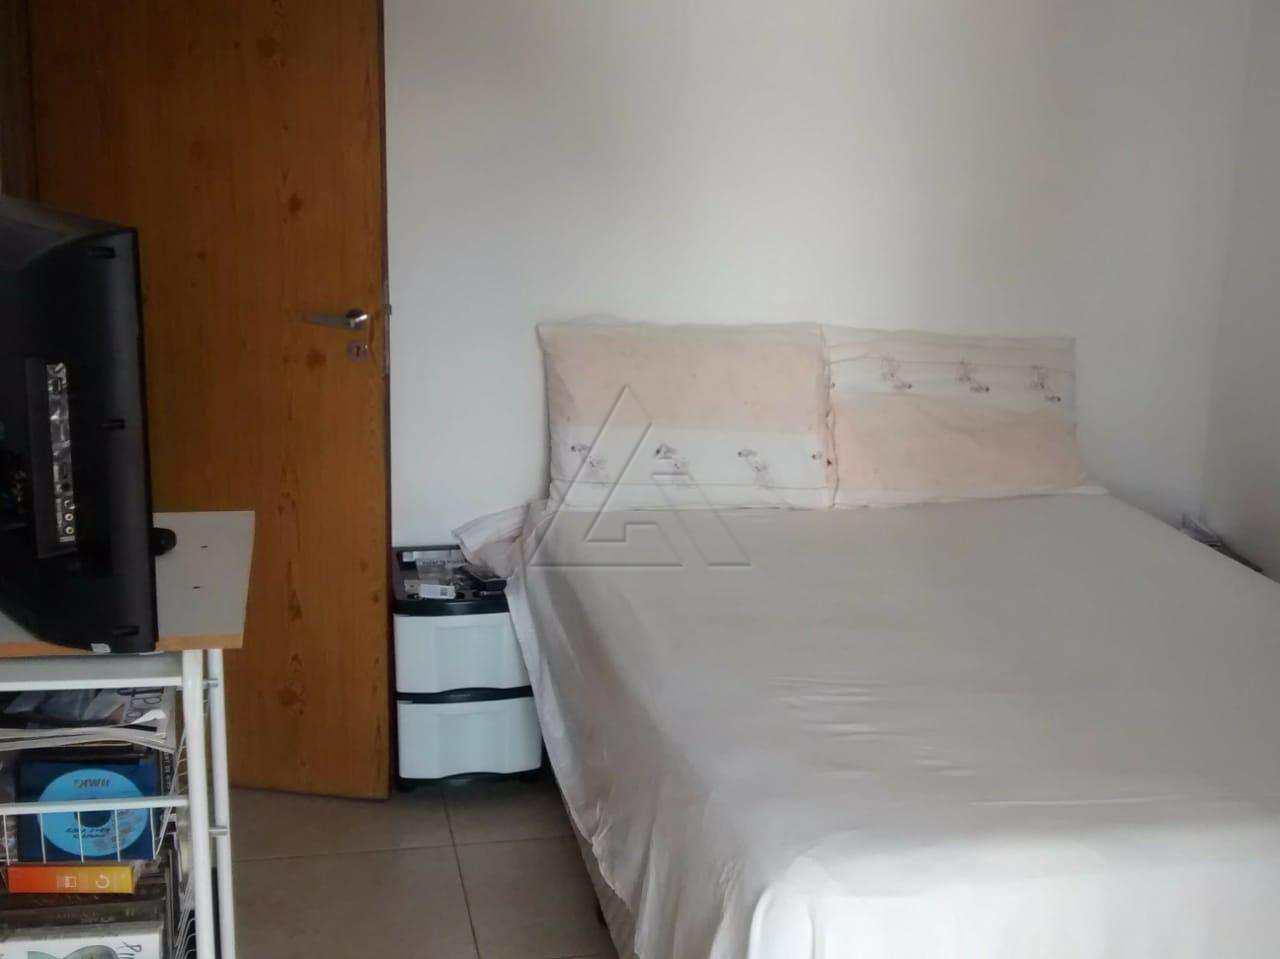 Sobrado 3 dorms/ 2vgs- Monte Kemel  R$ 350.000 ref. 2913